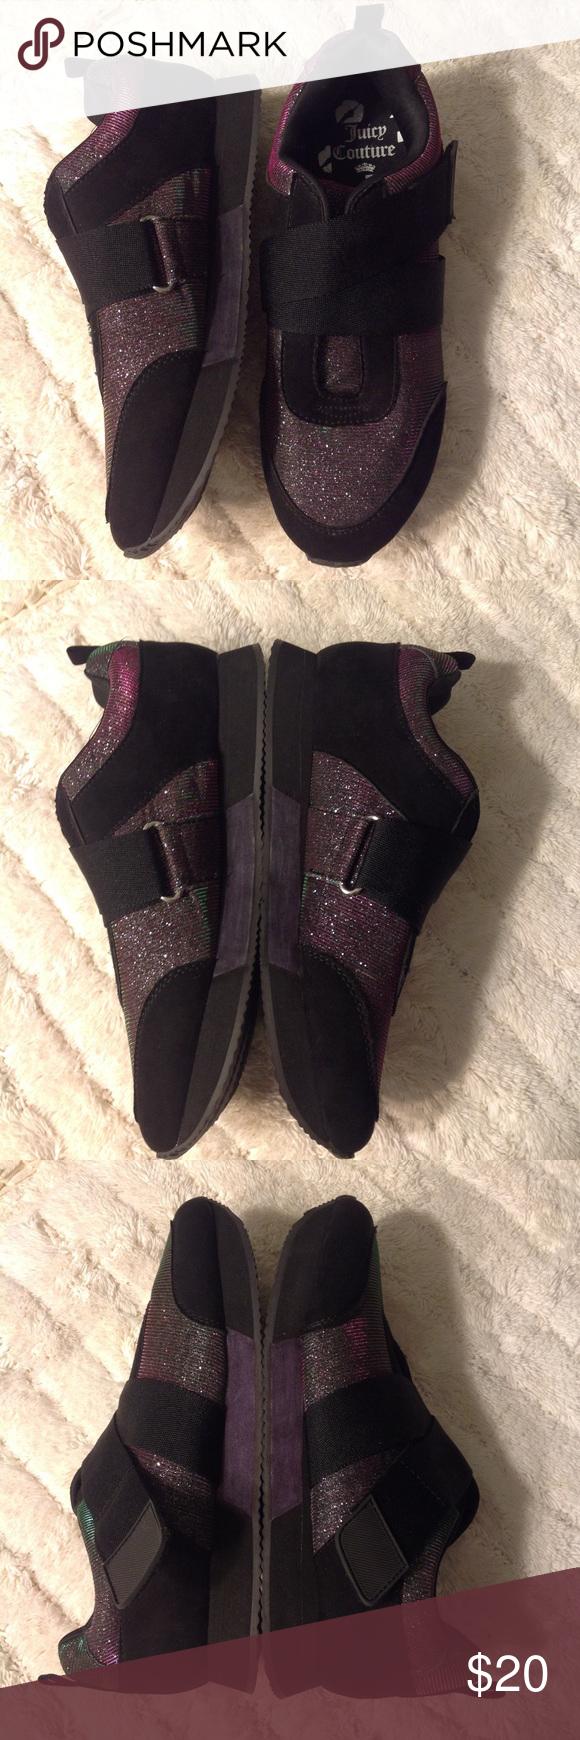 8d08baf4574 ⬇️price drop⬇️Juicy Couture metallic sneakers in 2018   My Posh ...